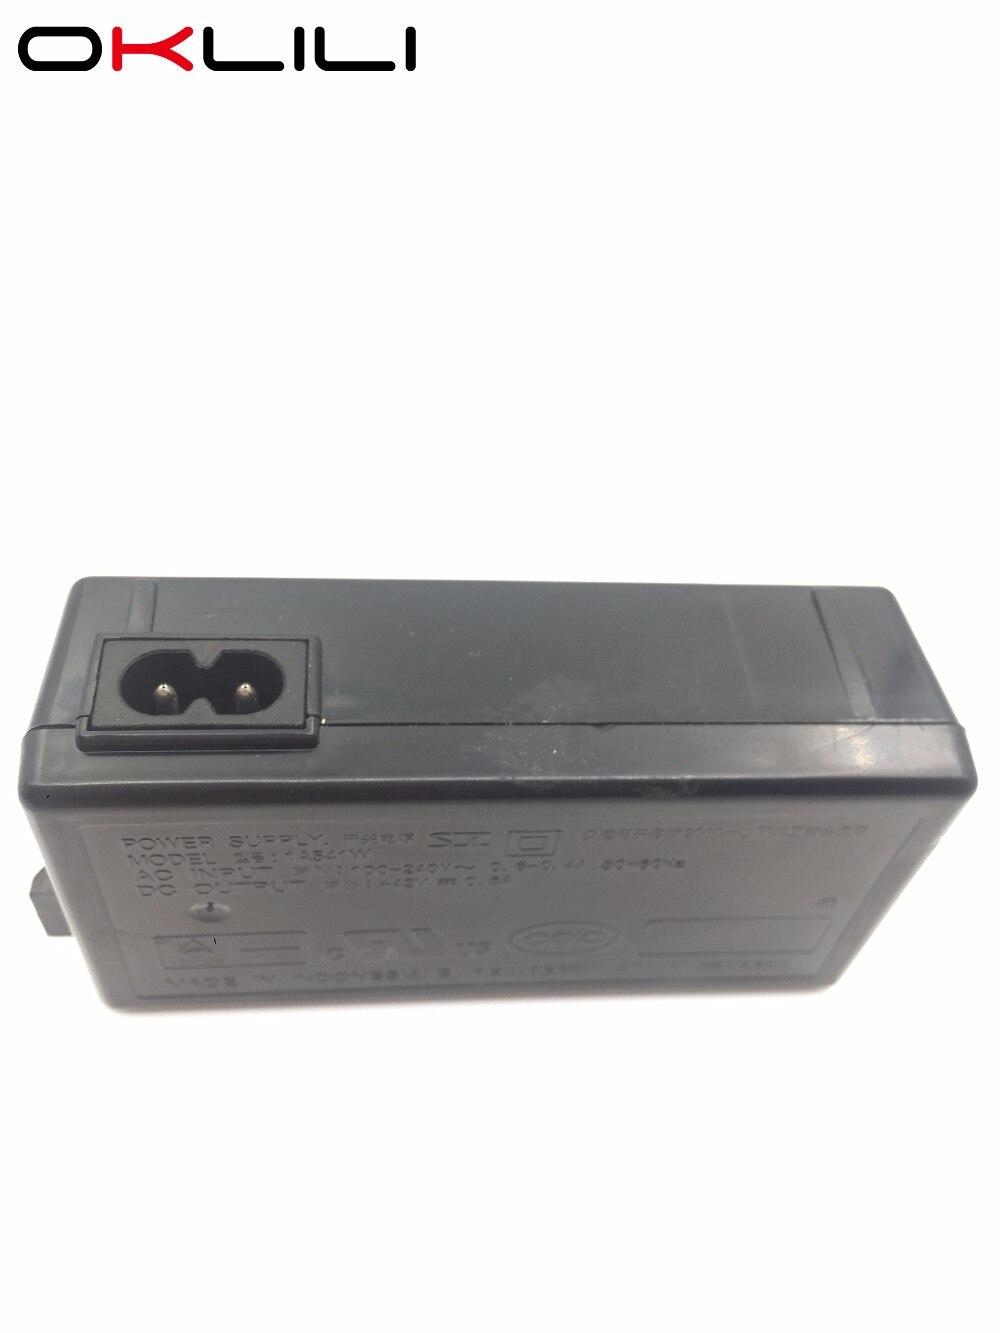 Gedisciplineerd Ac Power Supply Adapter Oplader Voor Epson L110 L120 L210 L220 L300 L310 L350 L355 L360 L365 L455 L555 L565 L100 L132 L130 L222 Mooi En Charmant